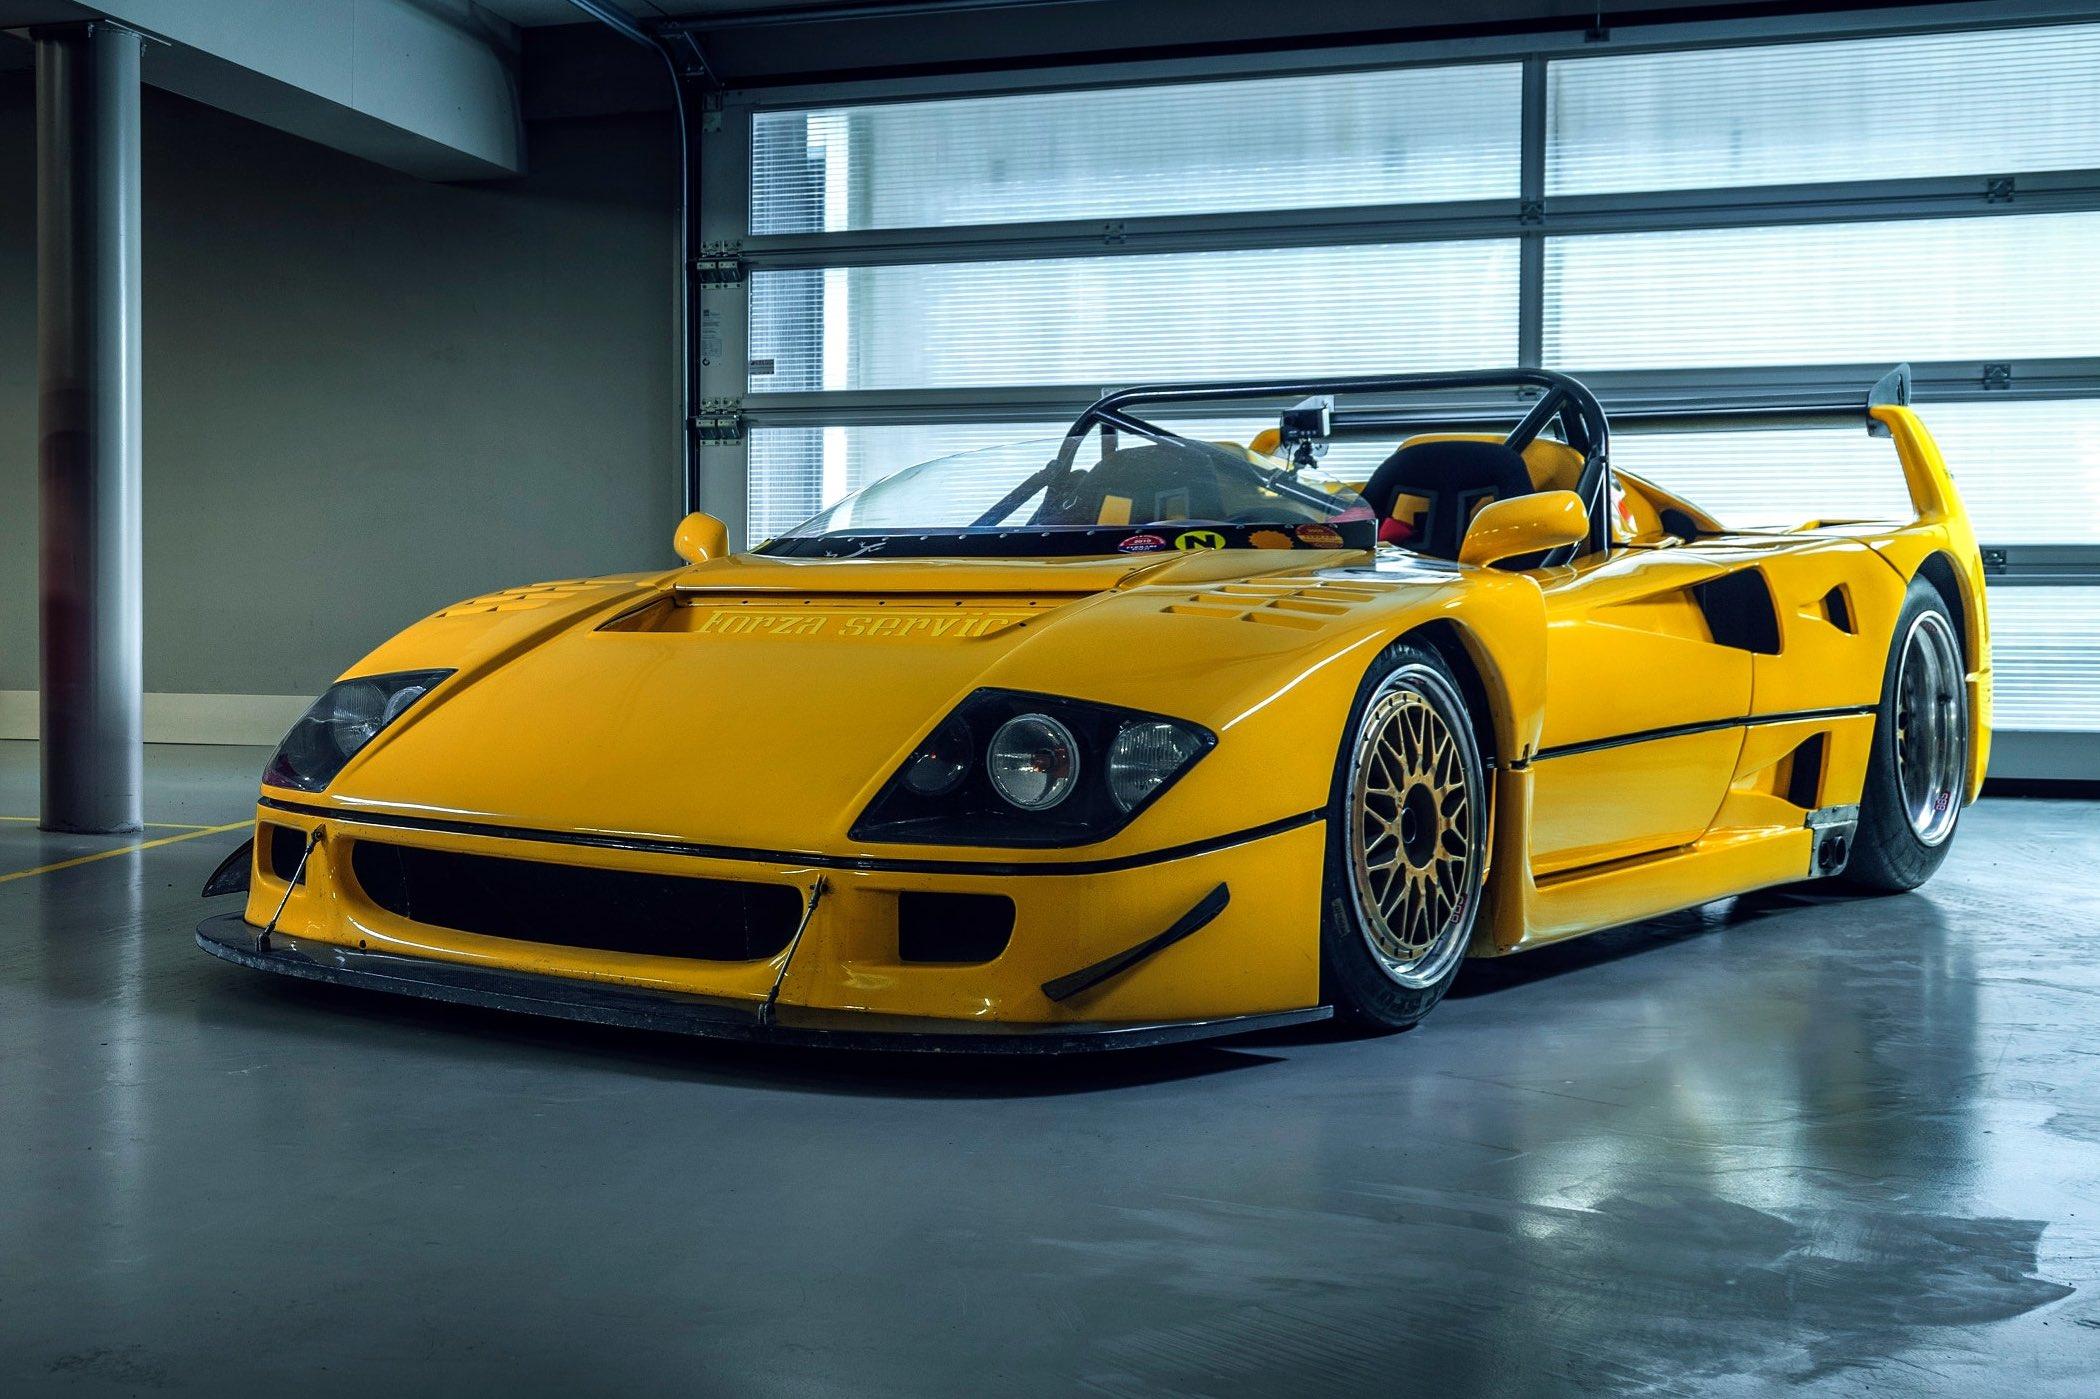 The Petrolhead Corner The Story Of Mystical Ferrari F40 Lm Barchetta